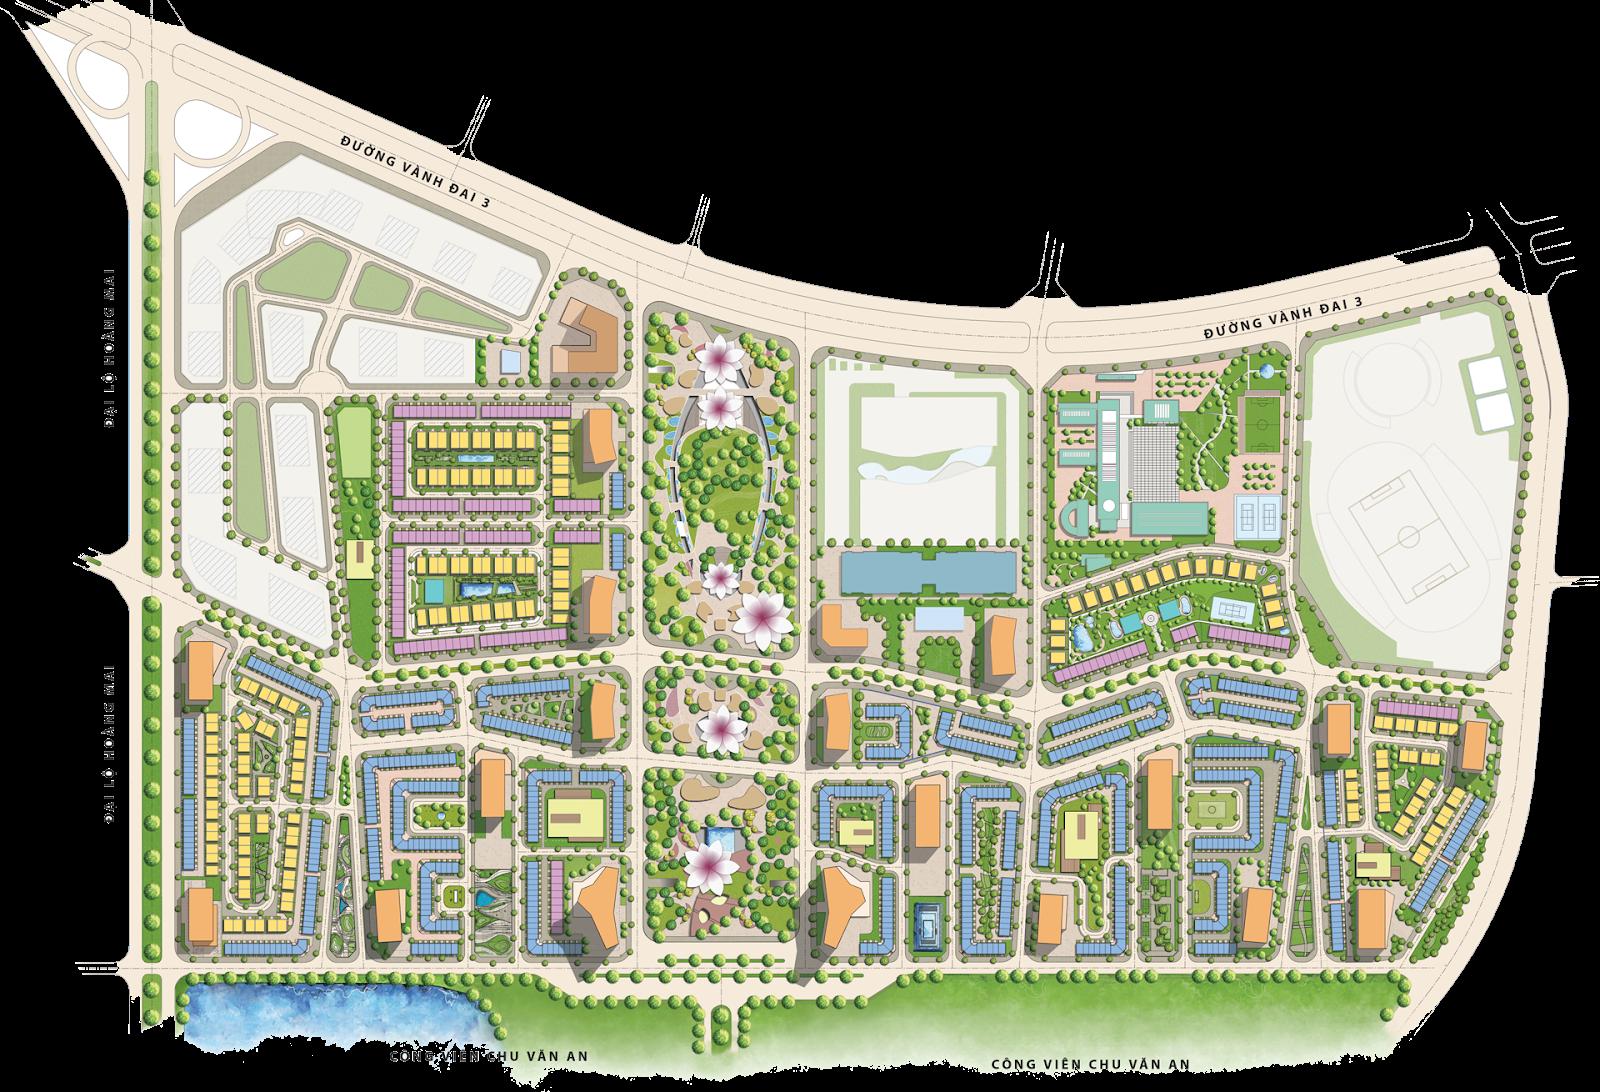 BẢN ĐỒ QUY HOẠCH THE MANOR CENTER PARK